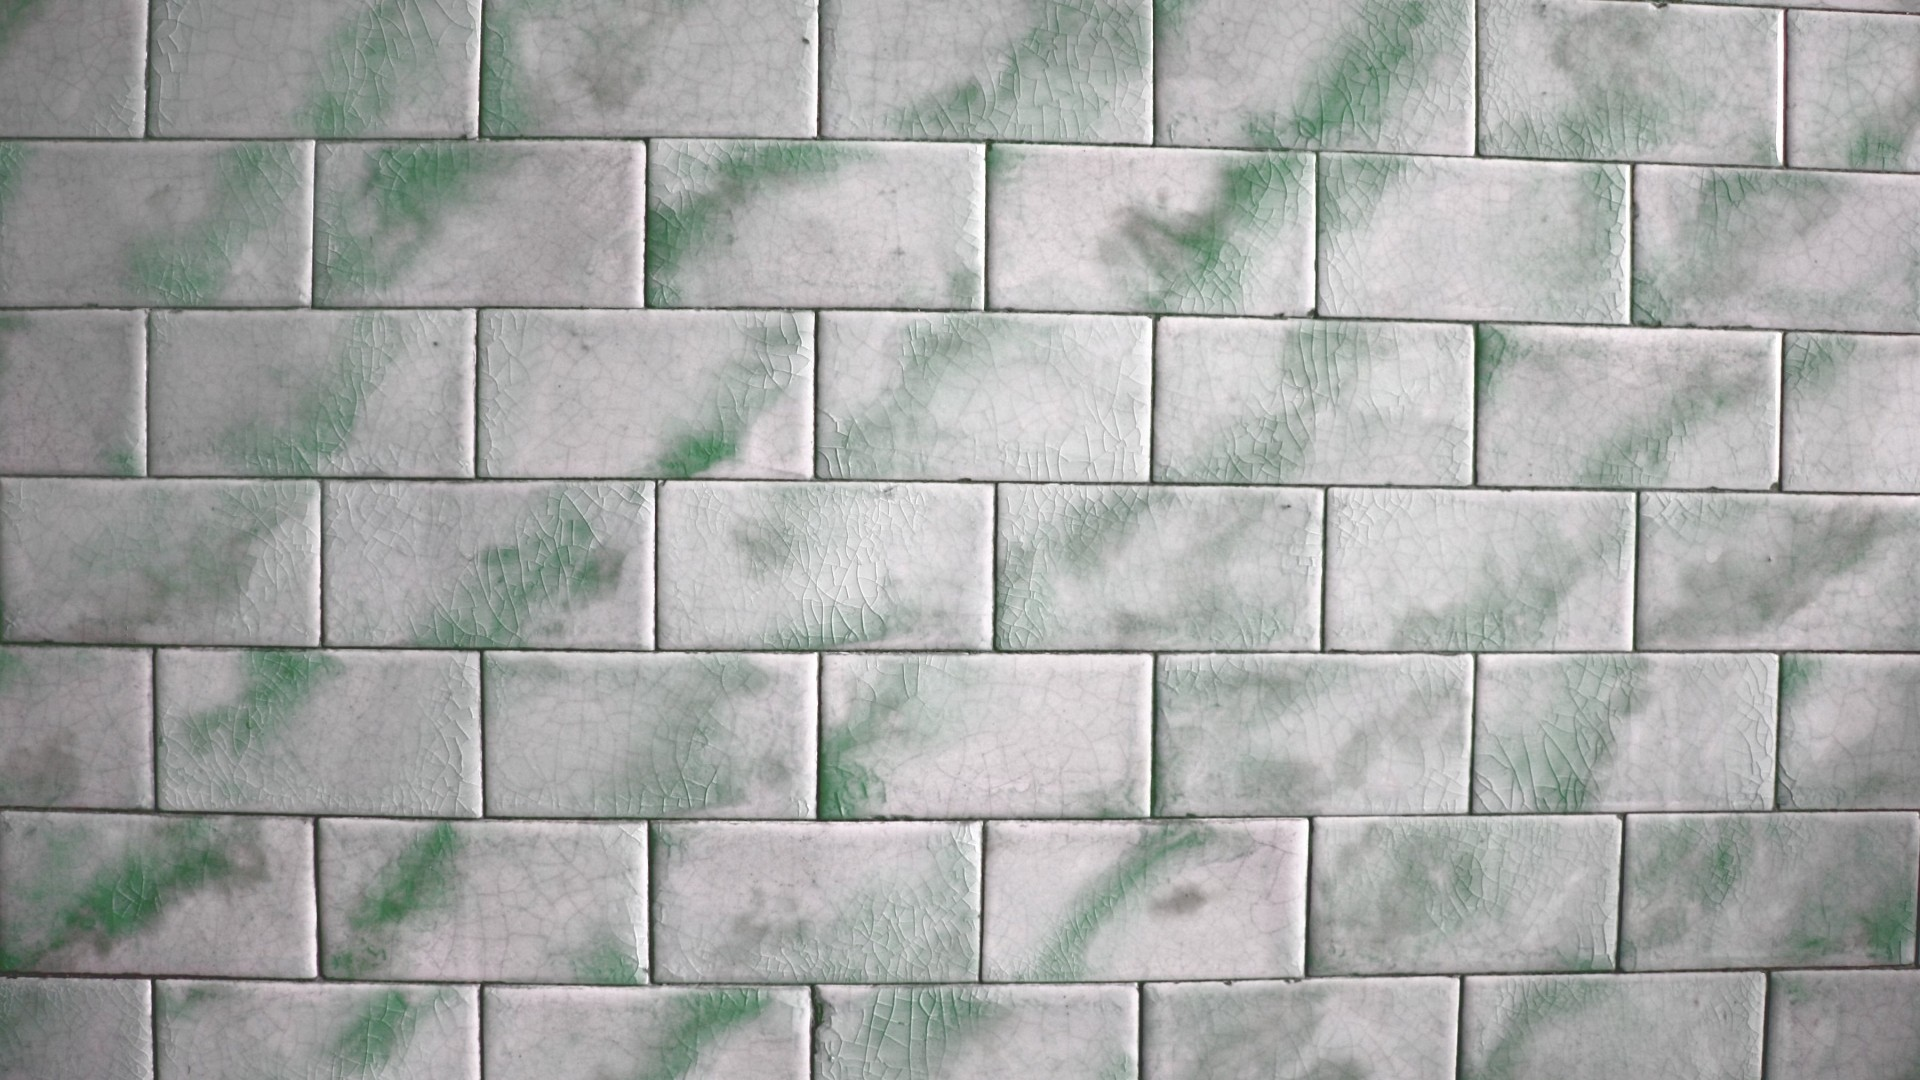 Tile Wallpaper image hd